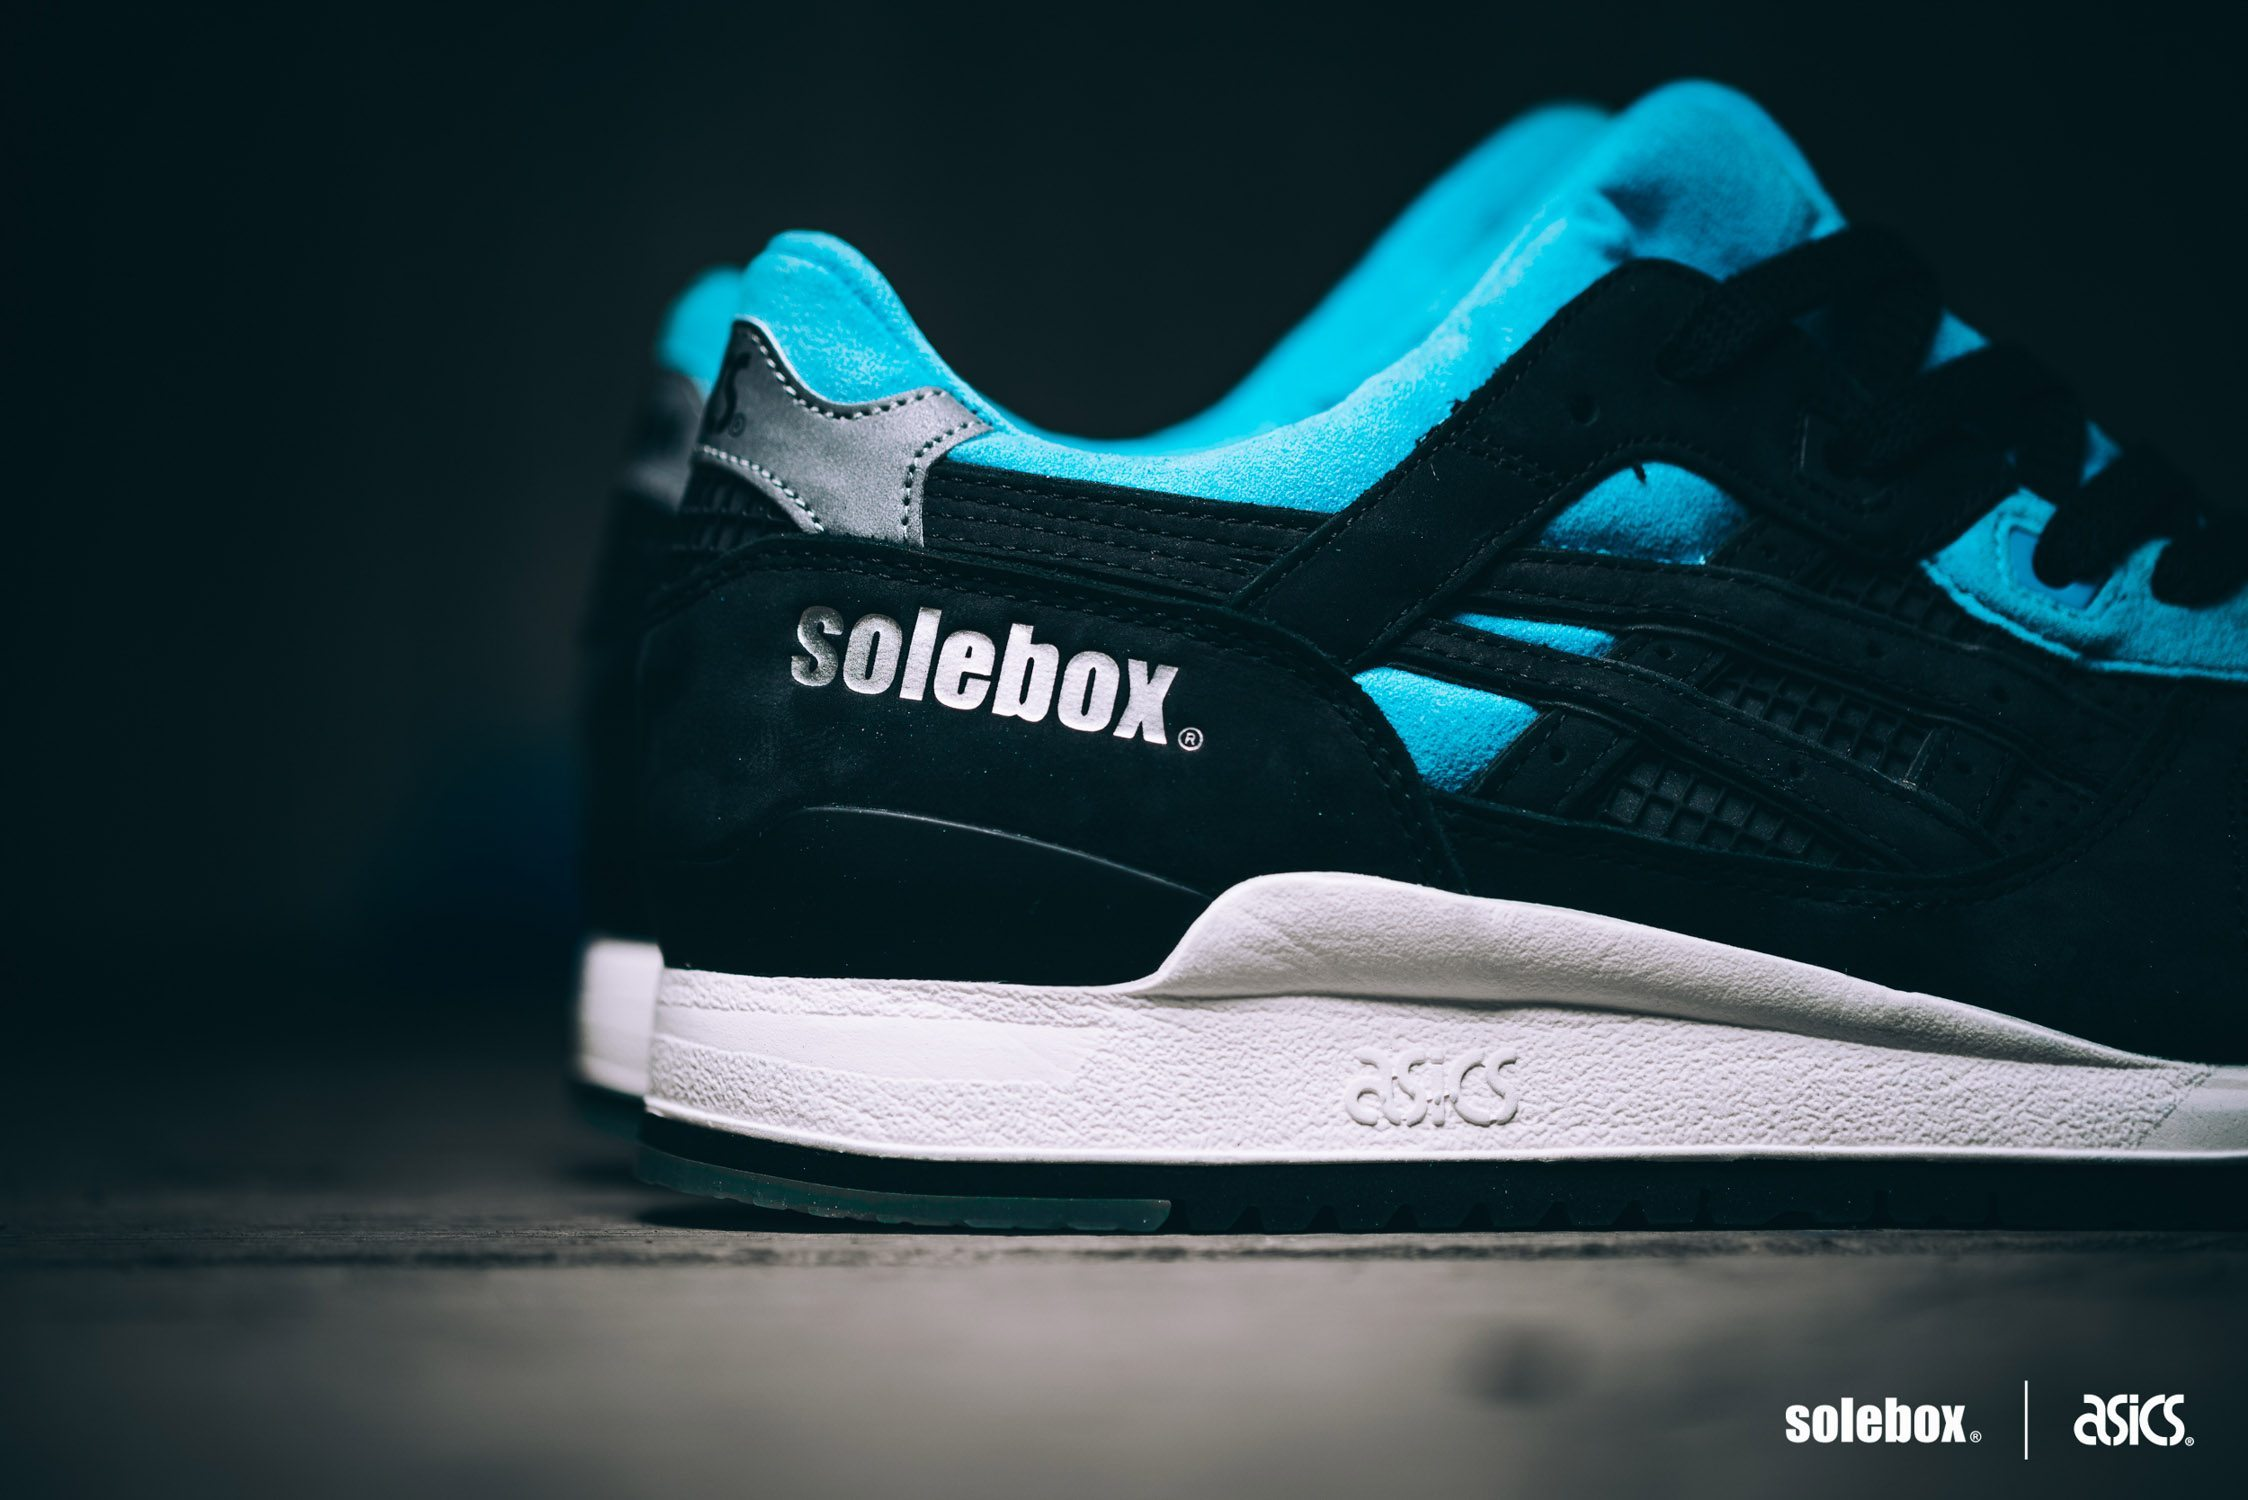 SOLEBOX x Asics Gel Lyte III 9